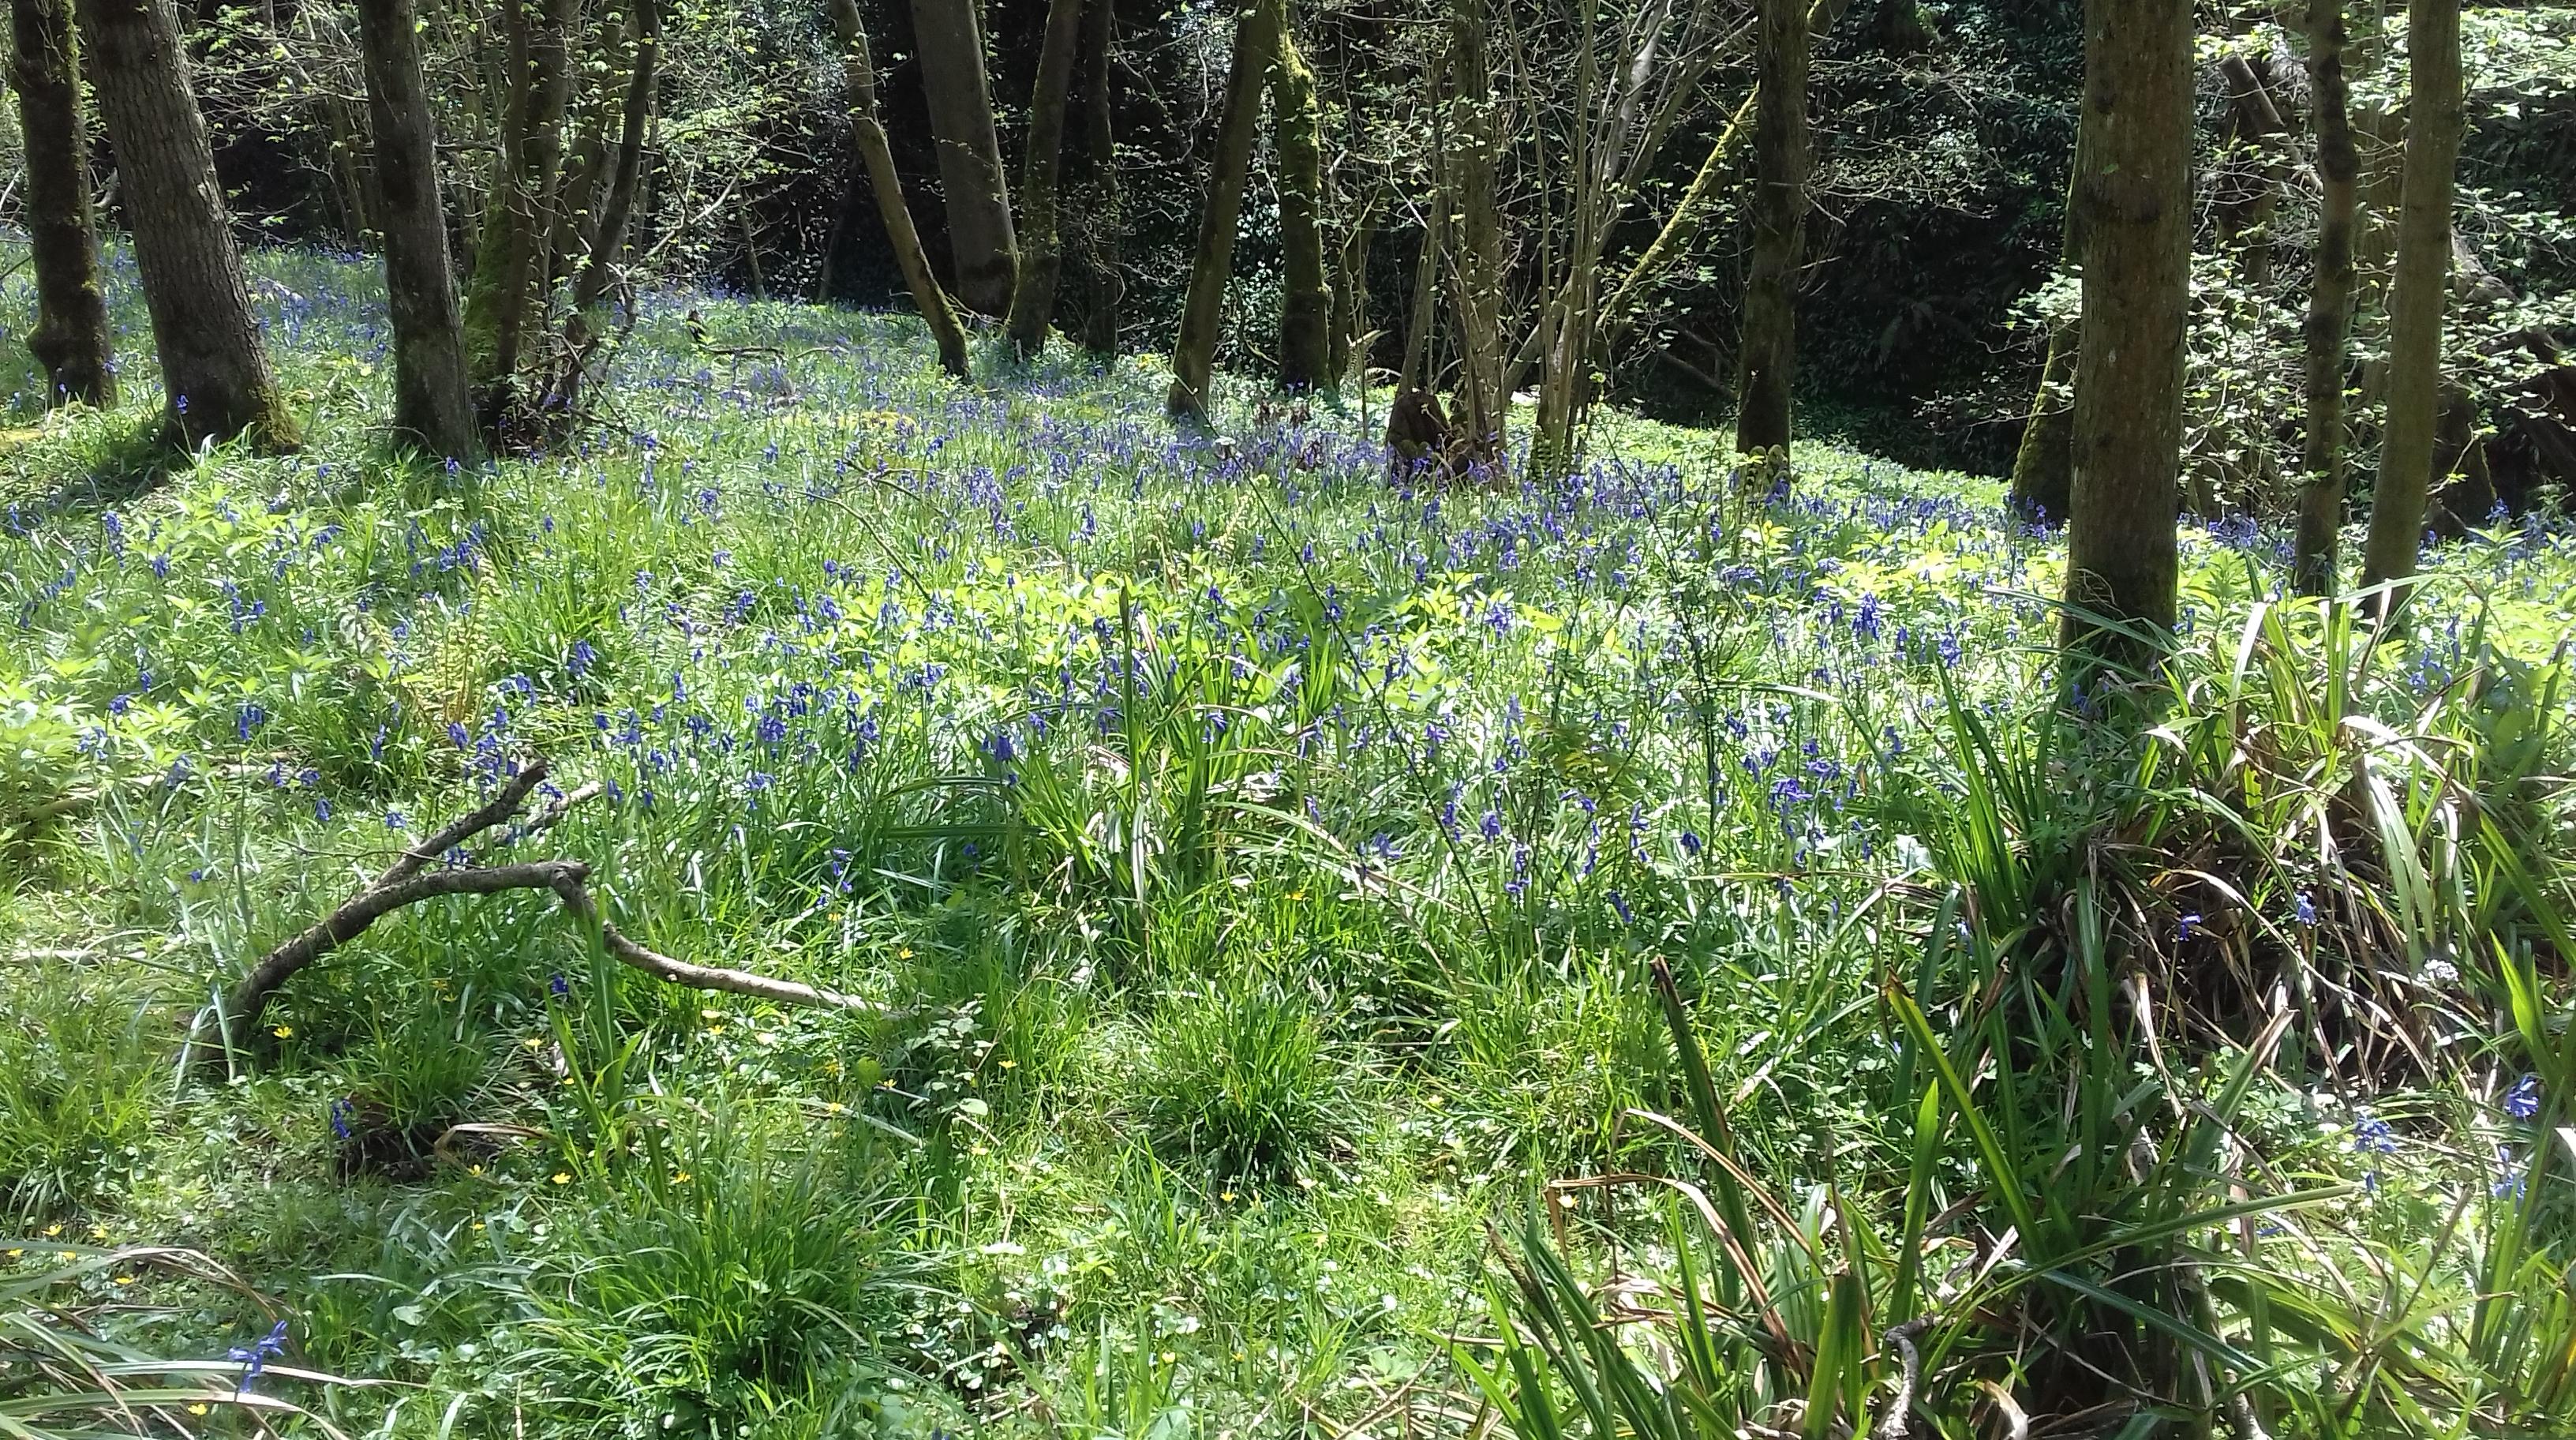 Bluebells under the trees #Folly farm #Avon Wildlife trust